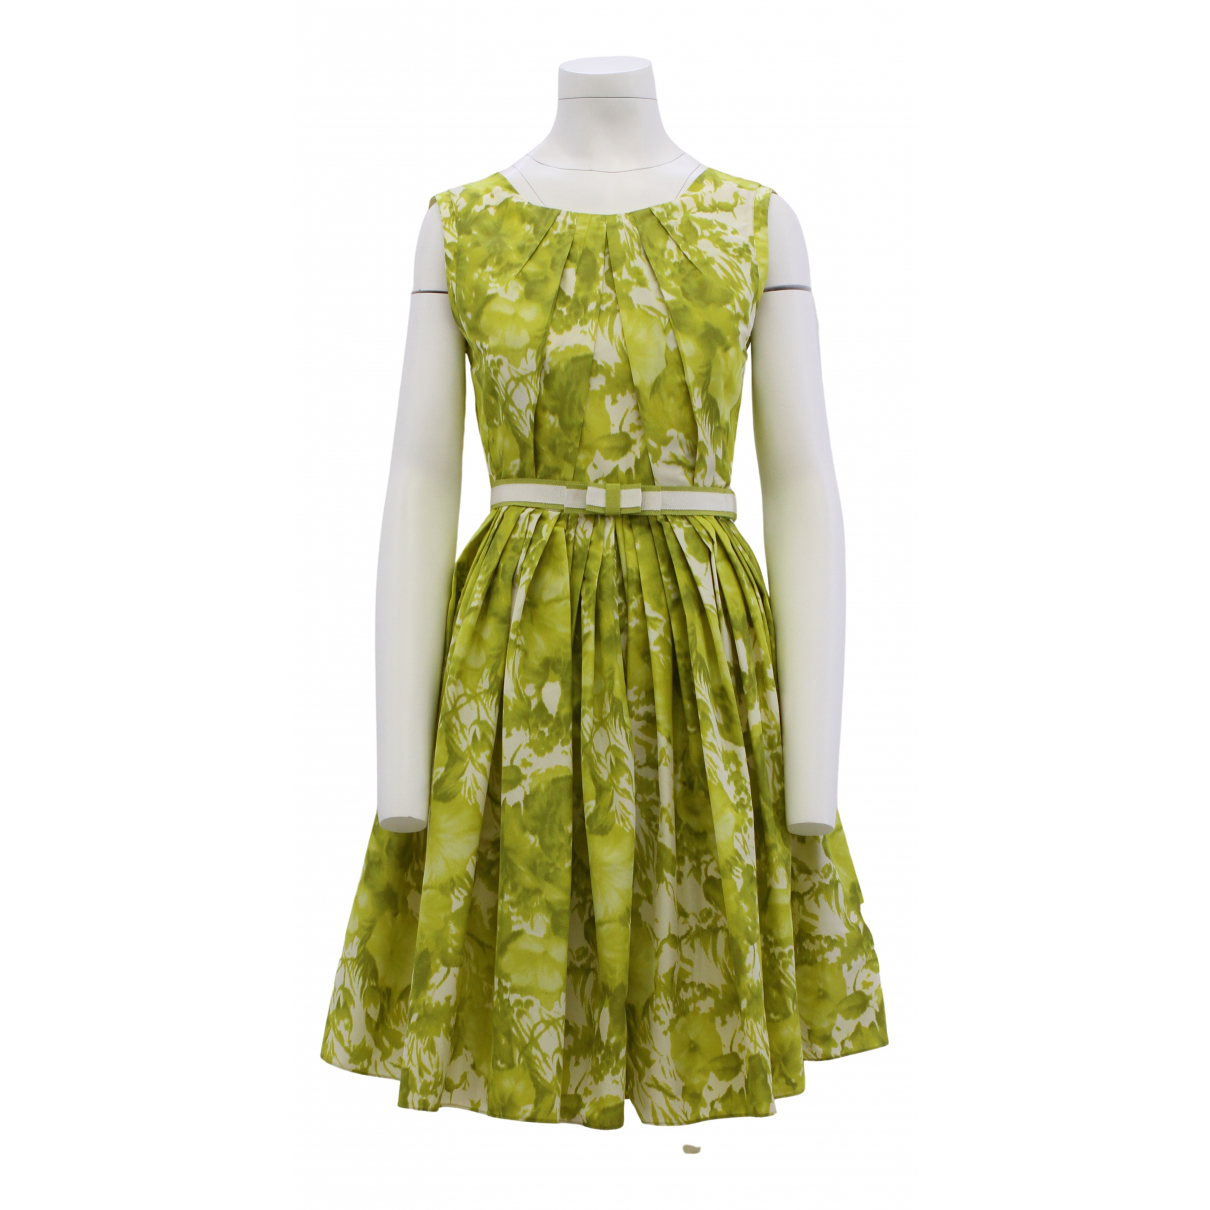 Antonio Marras \N Kleid in  Gruen Polyester